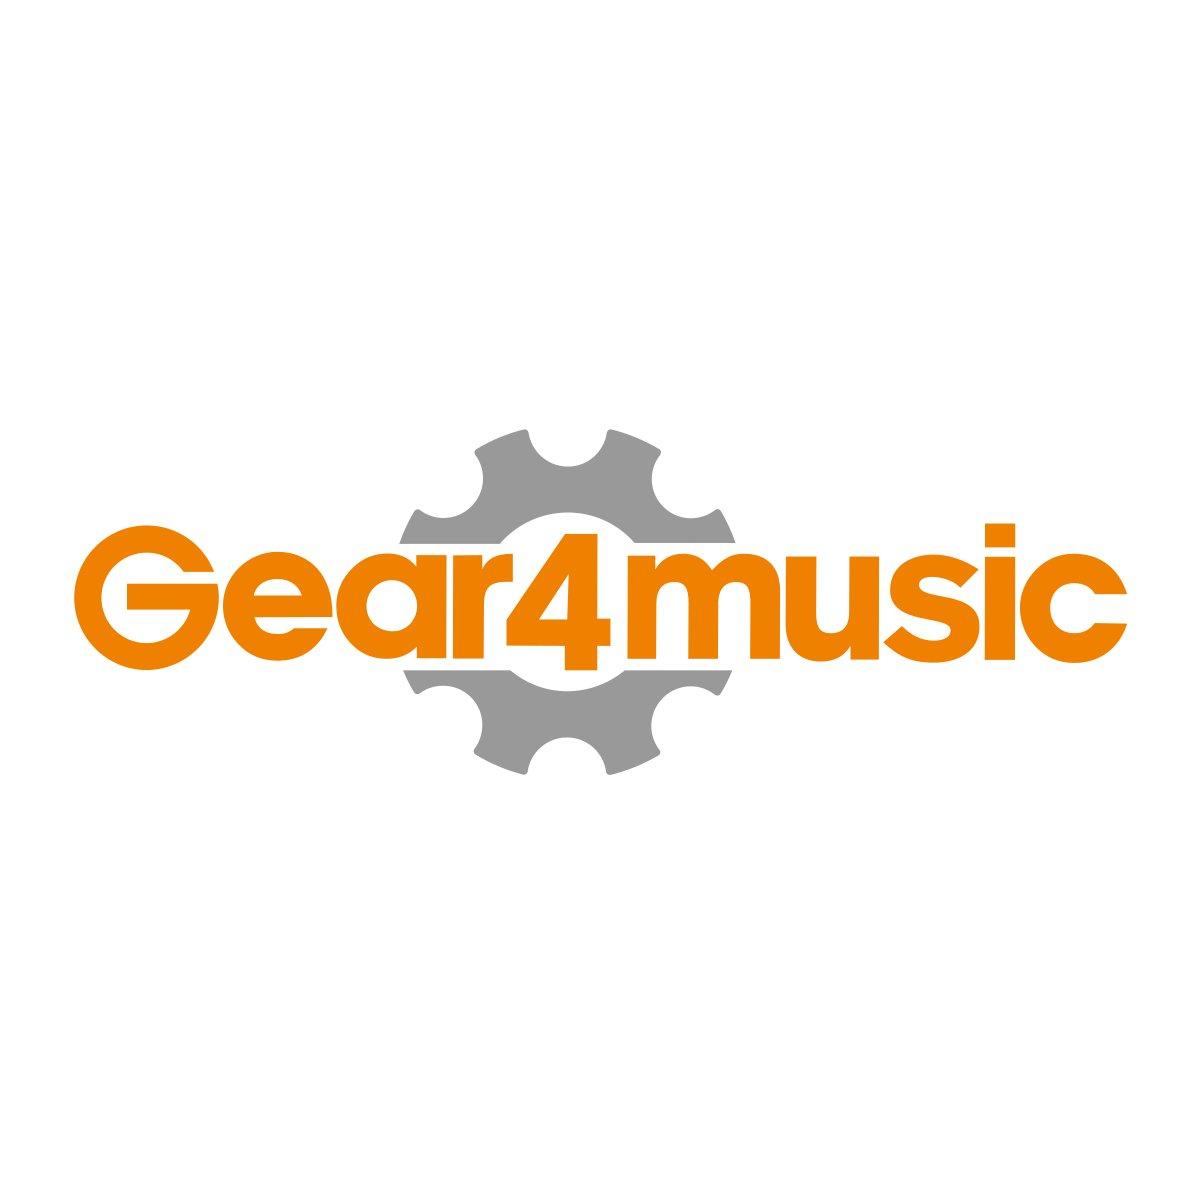 DP388 Digital Piano by Gear4music